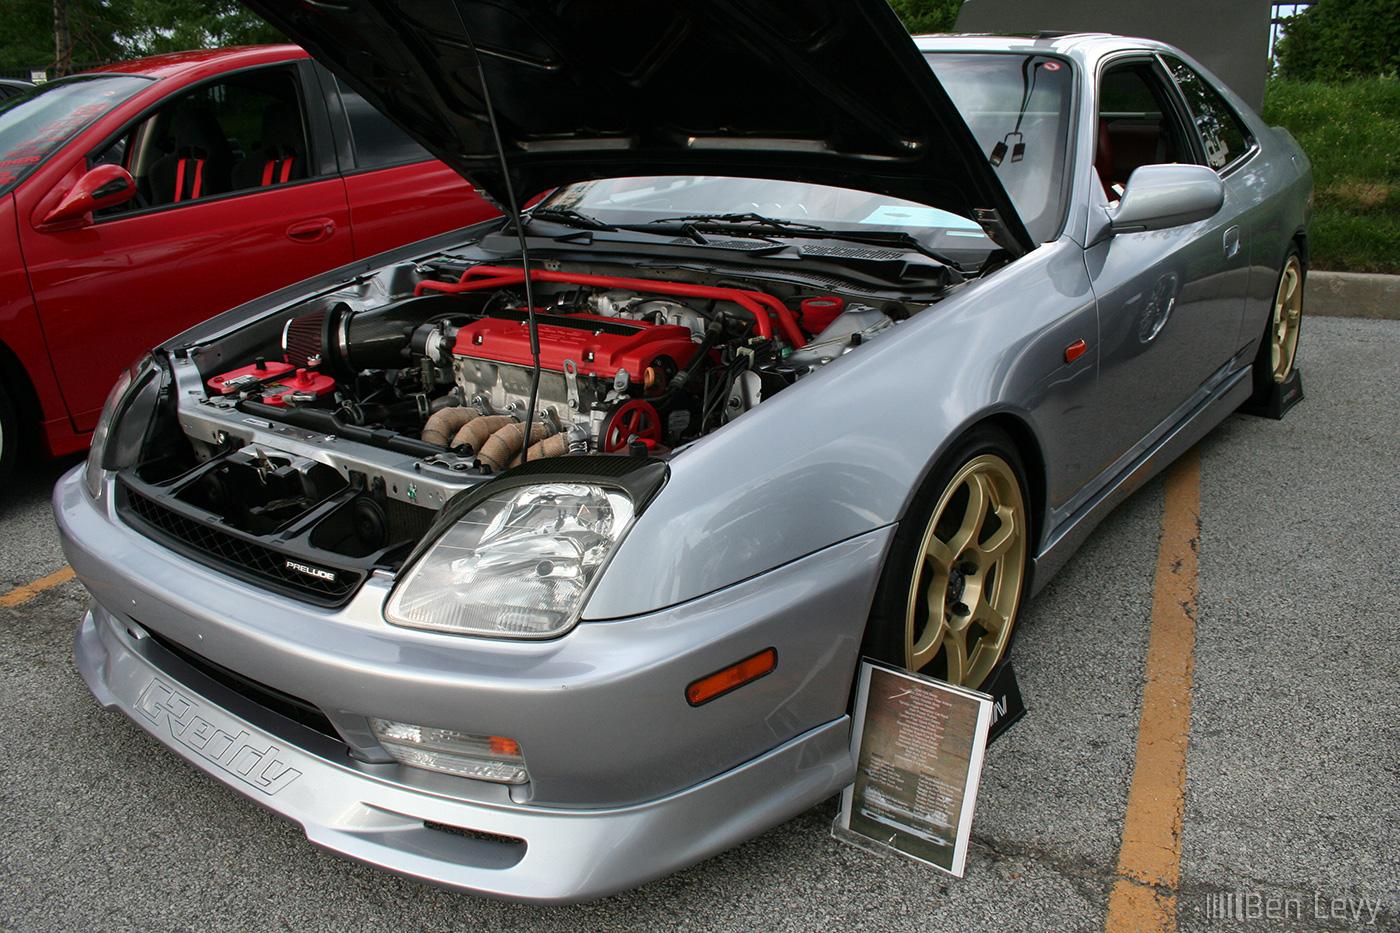 Silver Honda Prelude Benlevy Com